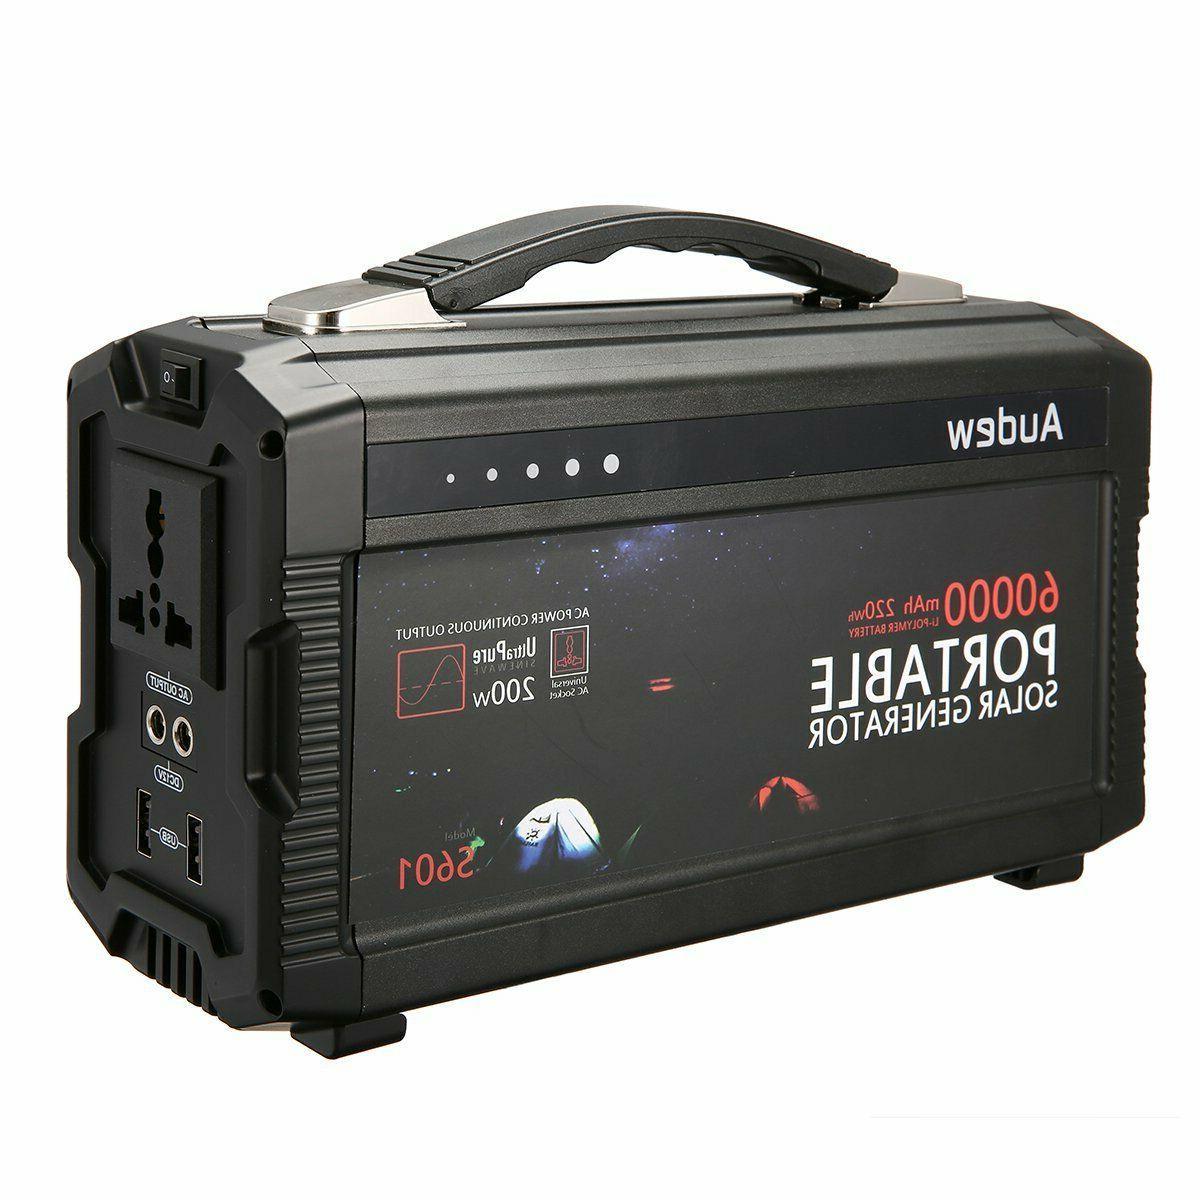 portable inverter battery generator power source lithium